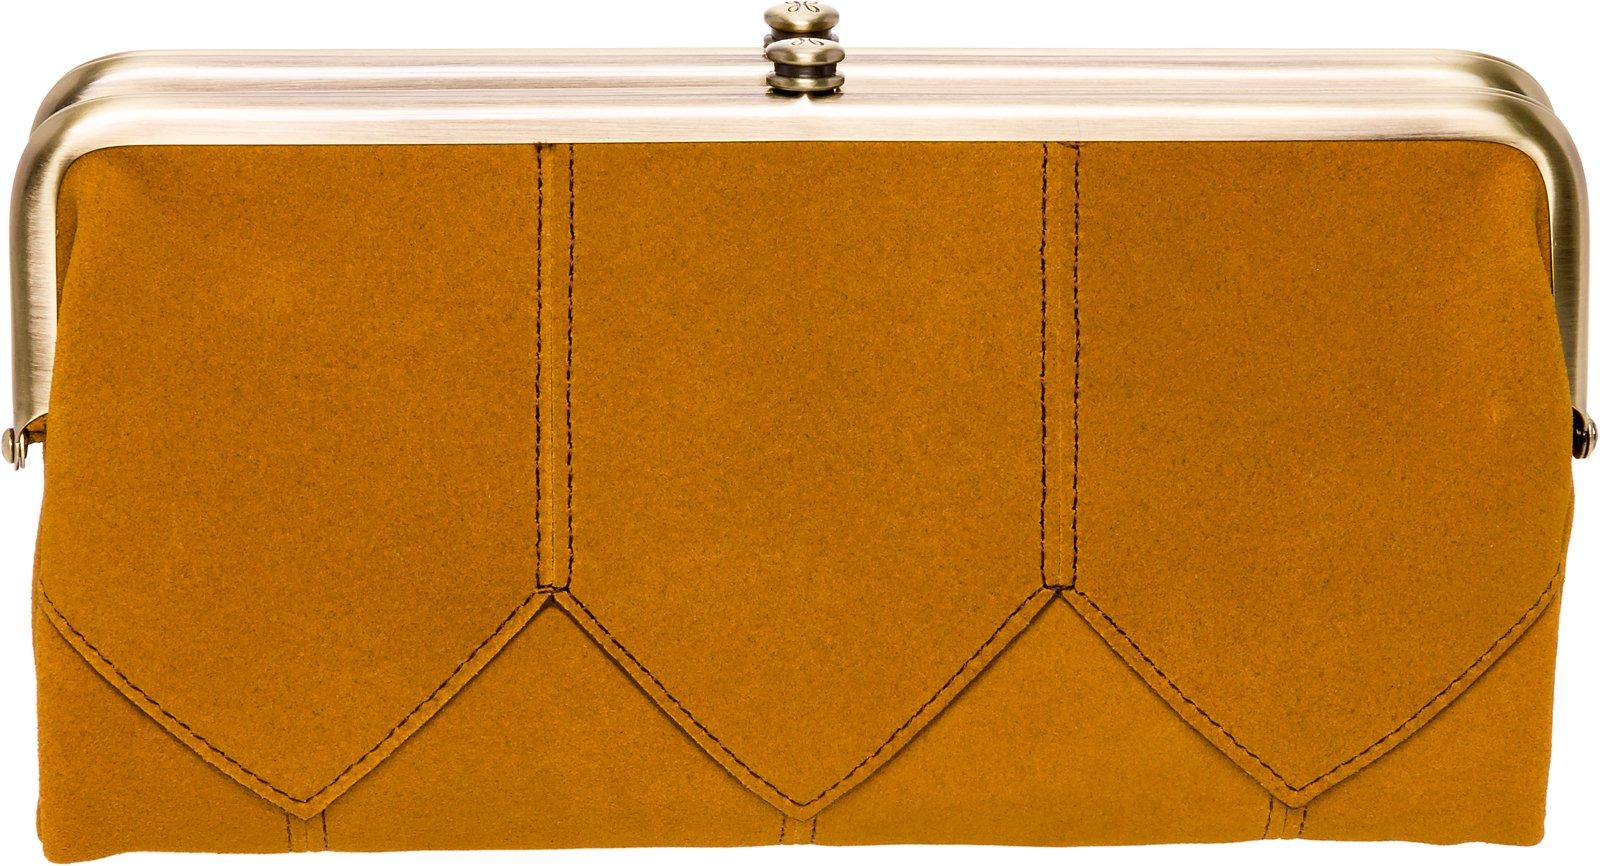 Hobo Womens Suede Vintage Lauren Clutch Wallet Purse (Harvest)